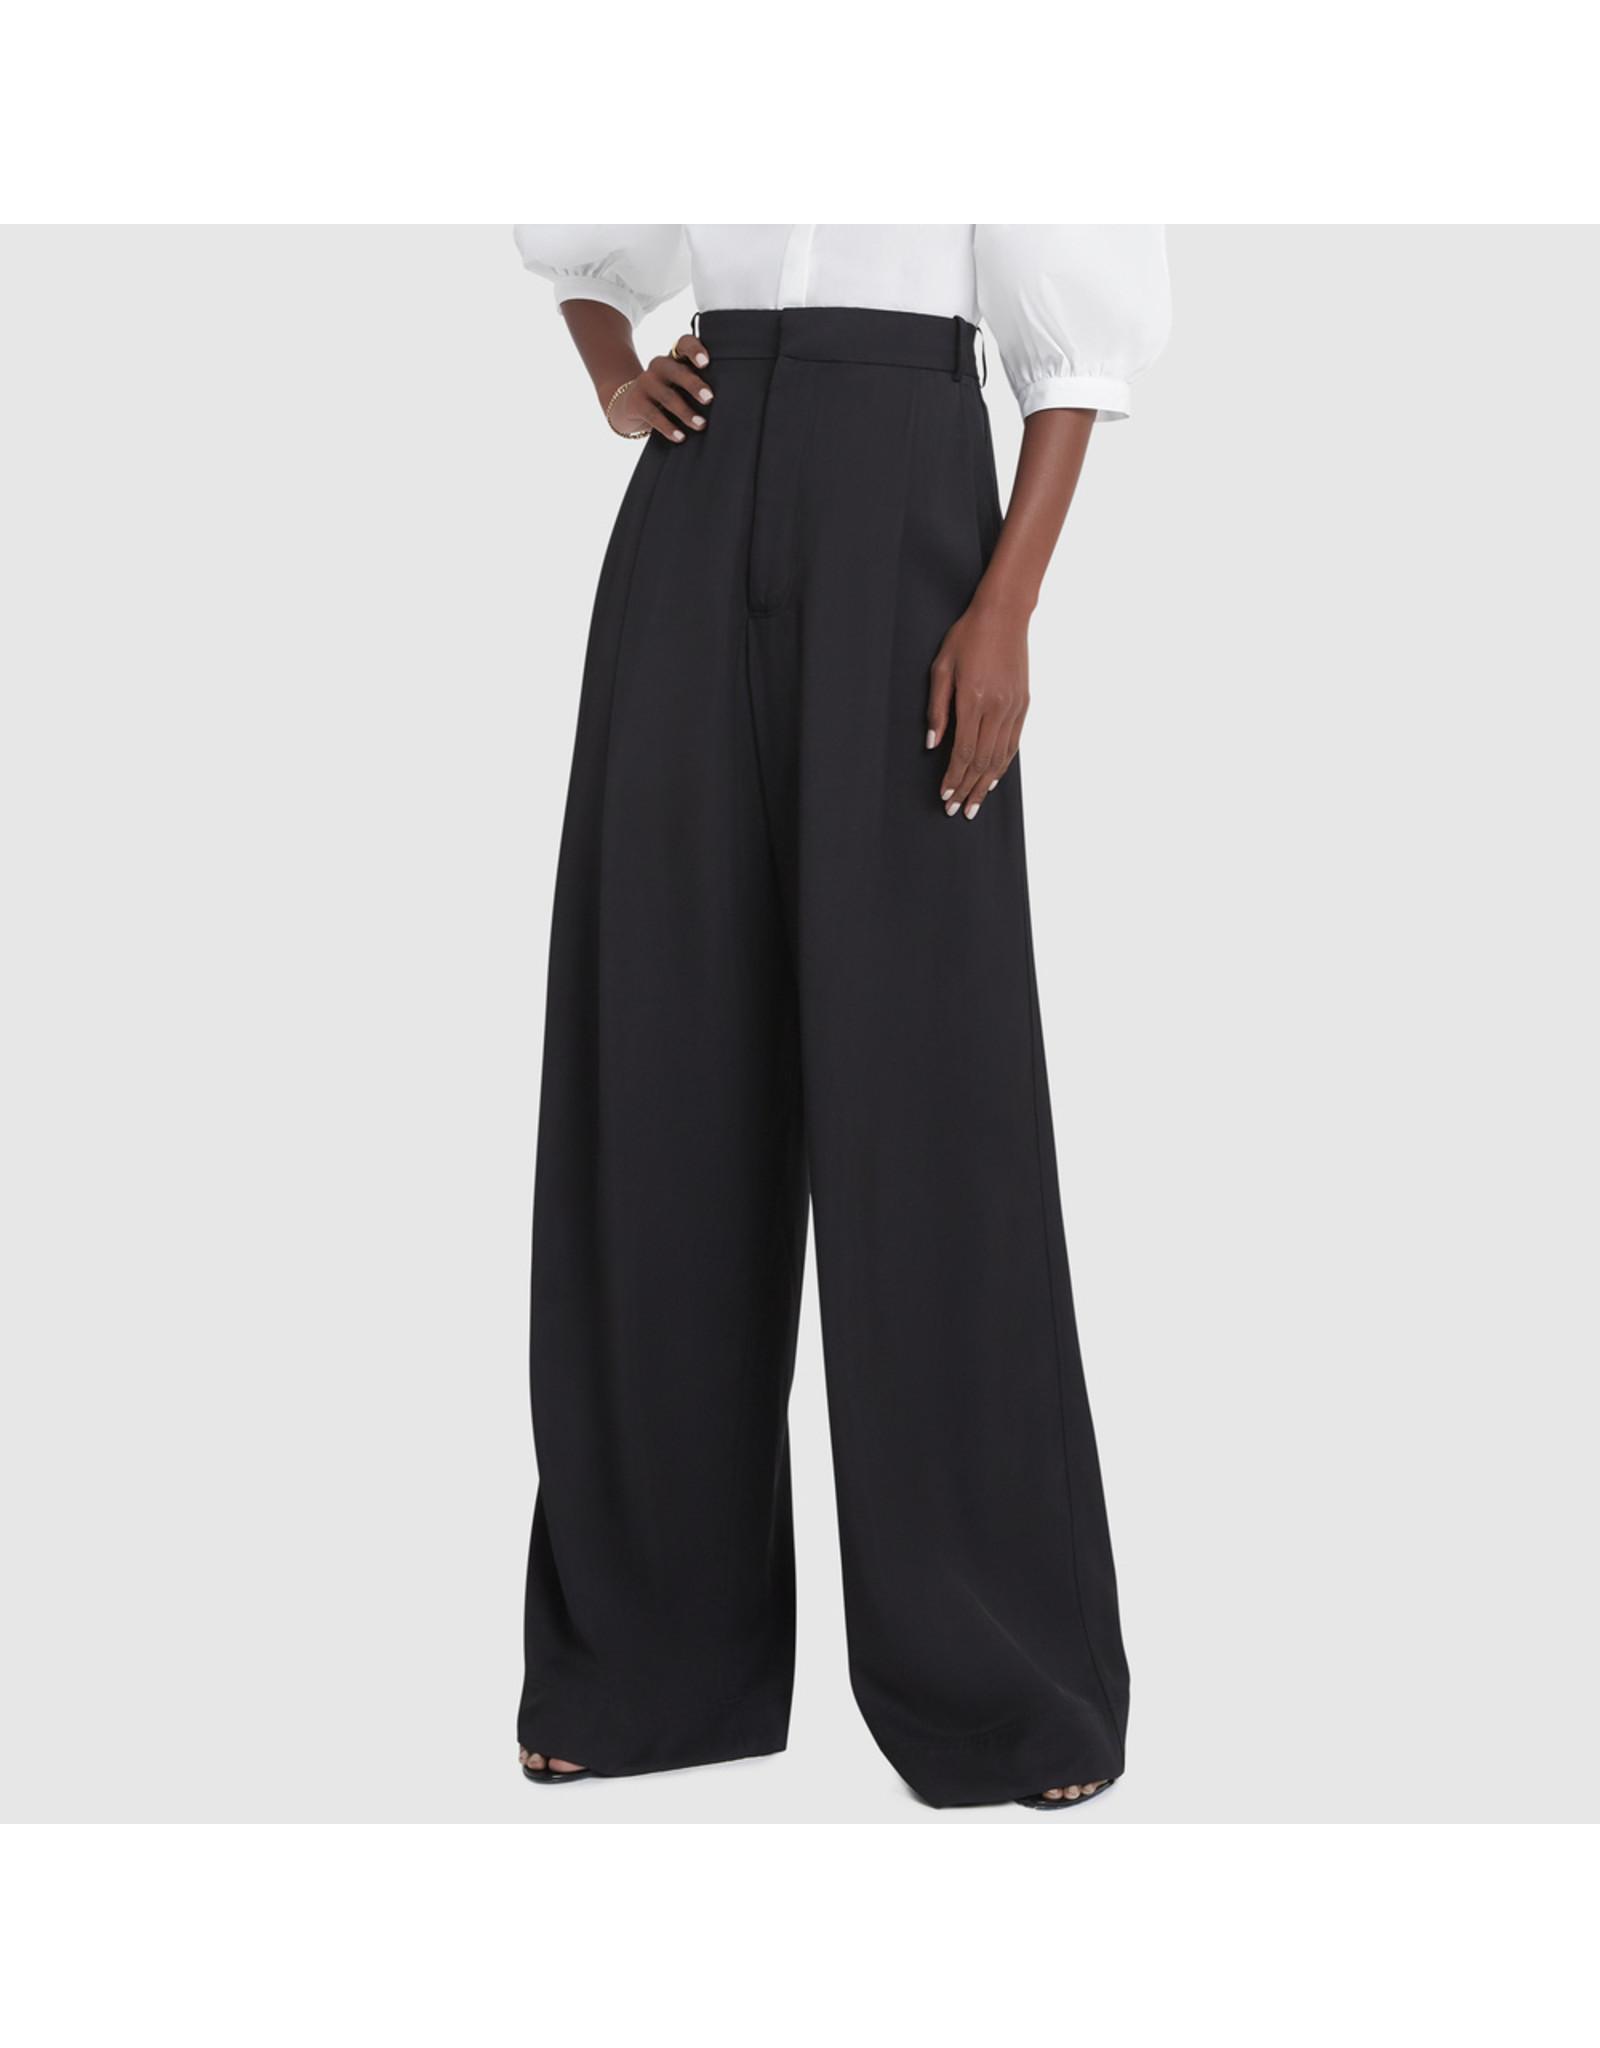 G. Label G. Label Kelly Wide-Leg Trousers (Color: Black, Size: 6)